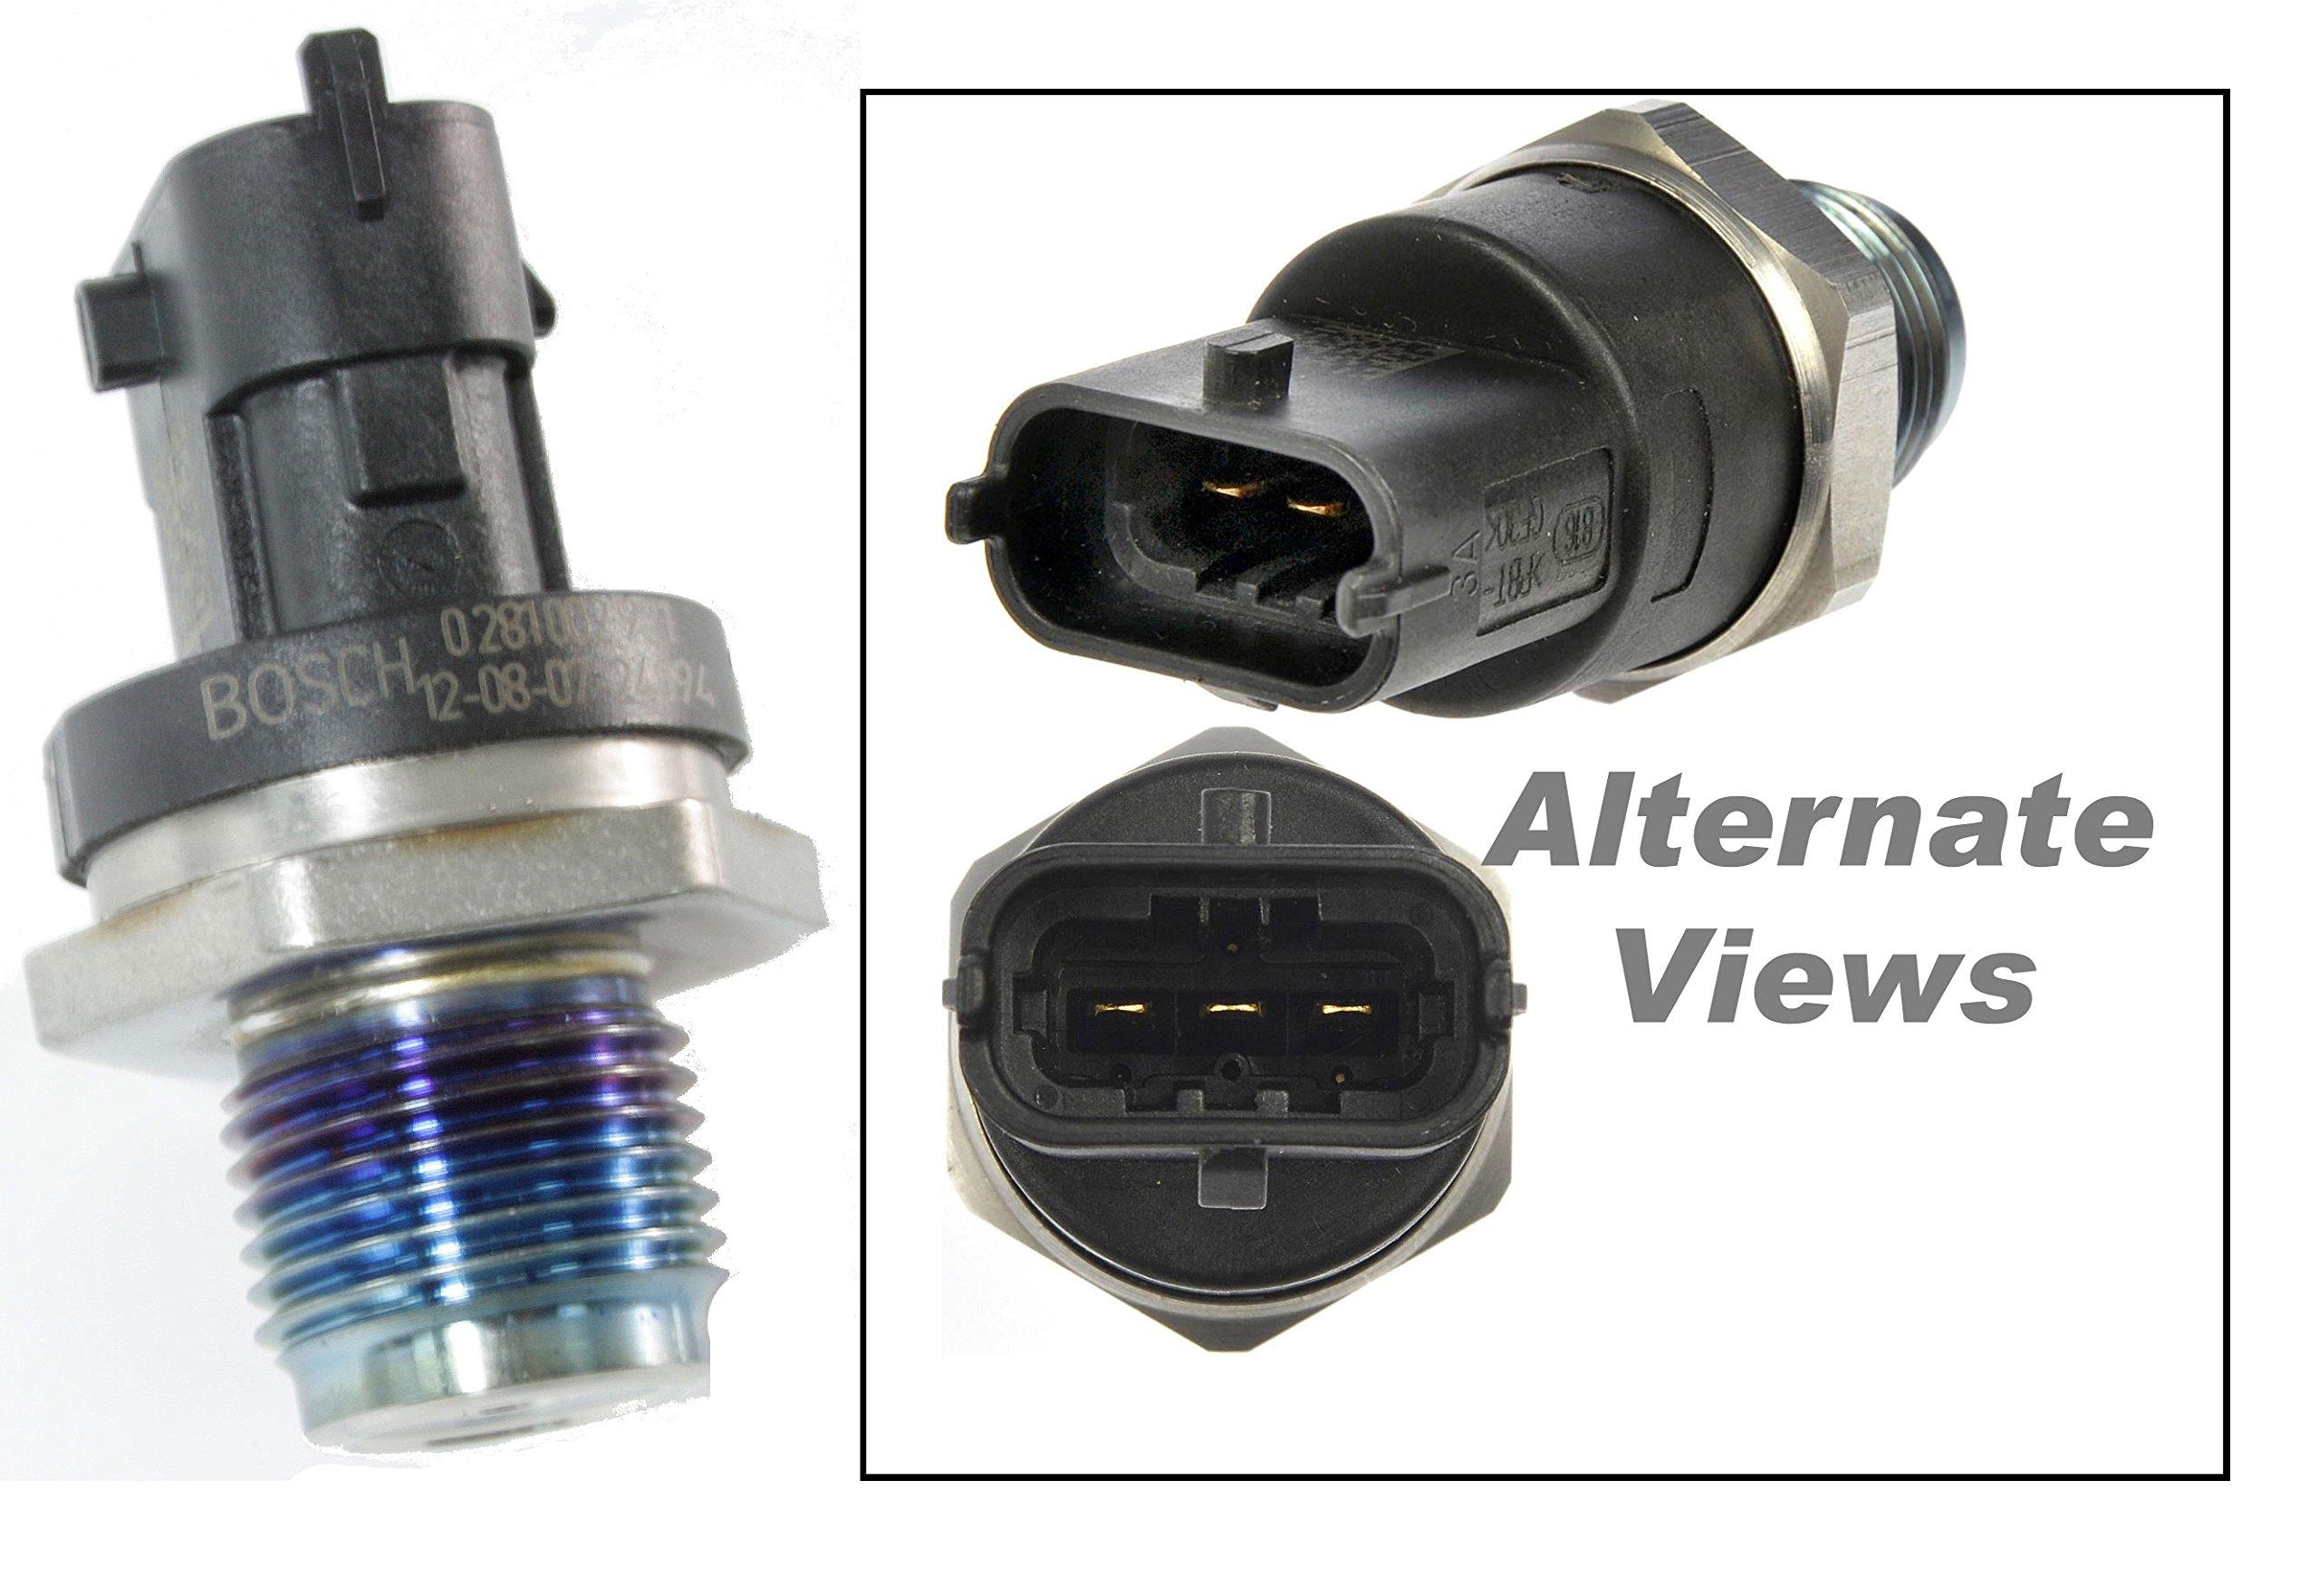 APDTY 015410 Fuel Rail High Pressure Sensor Fits 2003-2007 Dodge RAM 2500 3500 5.9L Cummins Diesel Trucks (Replaces 5093112AA, 5260246, 5297641, 97361561)